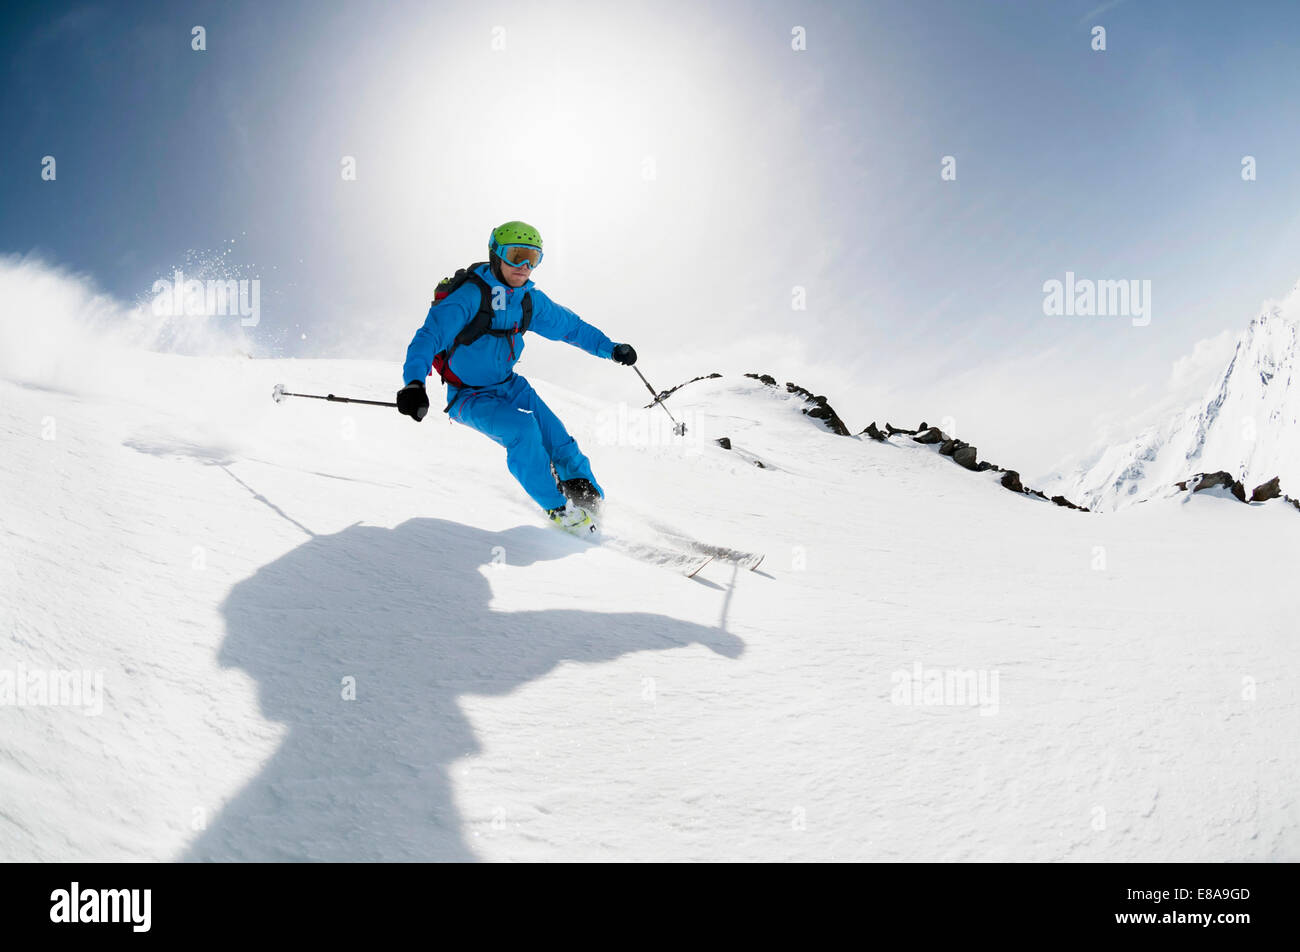 Man skier skiing downhill steep slope sunshine - Stock Image